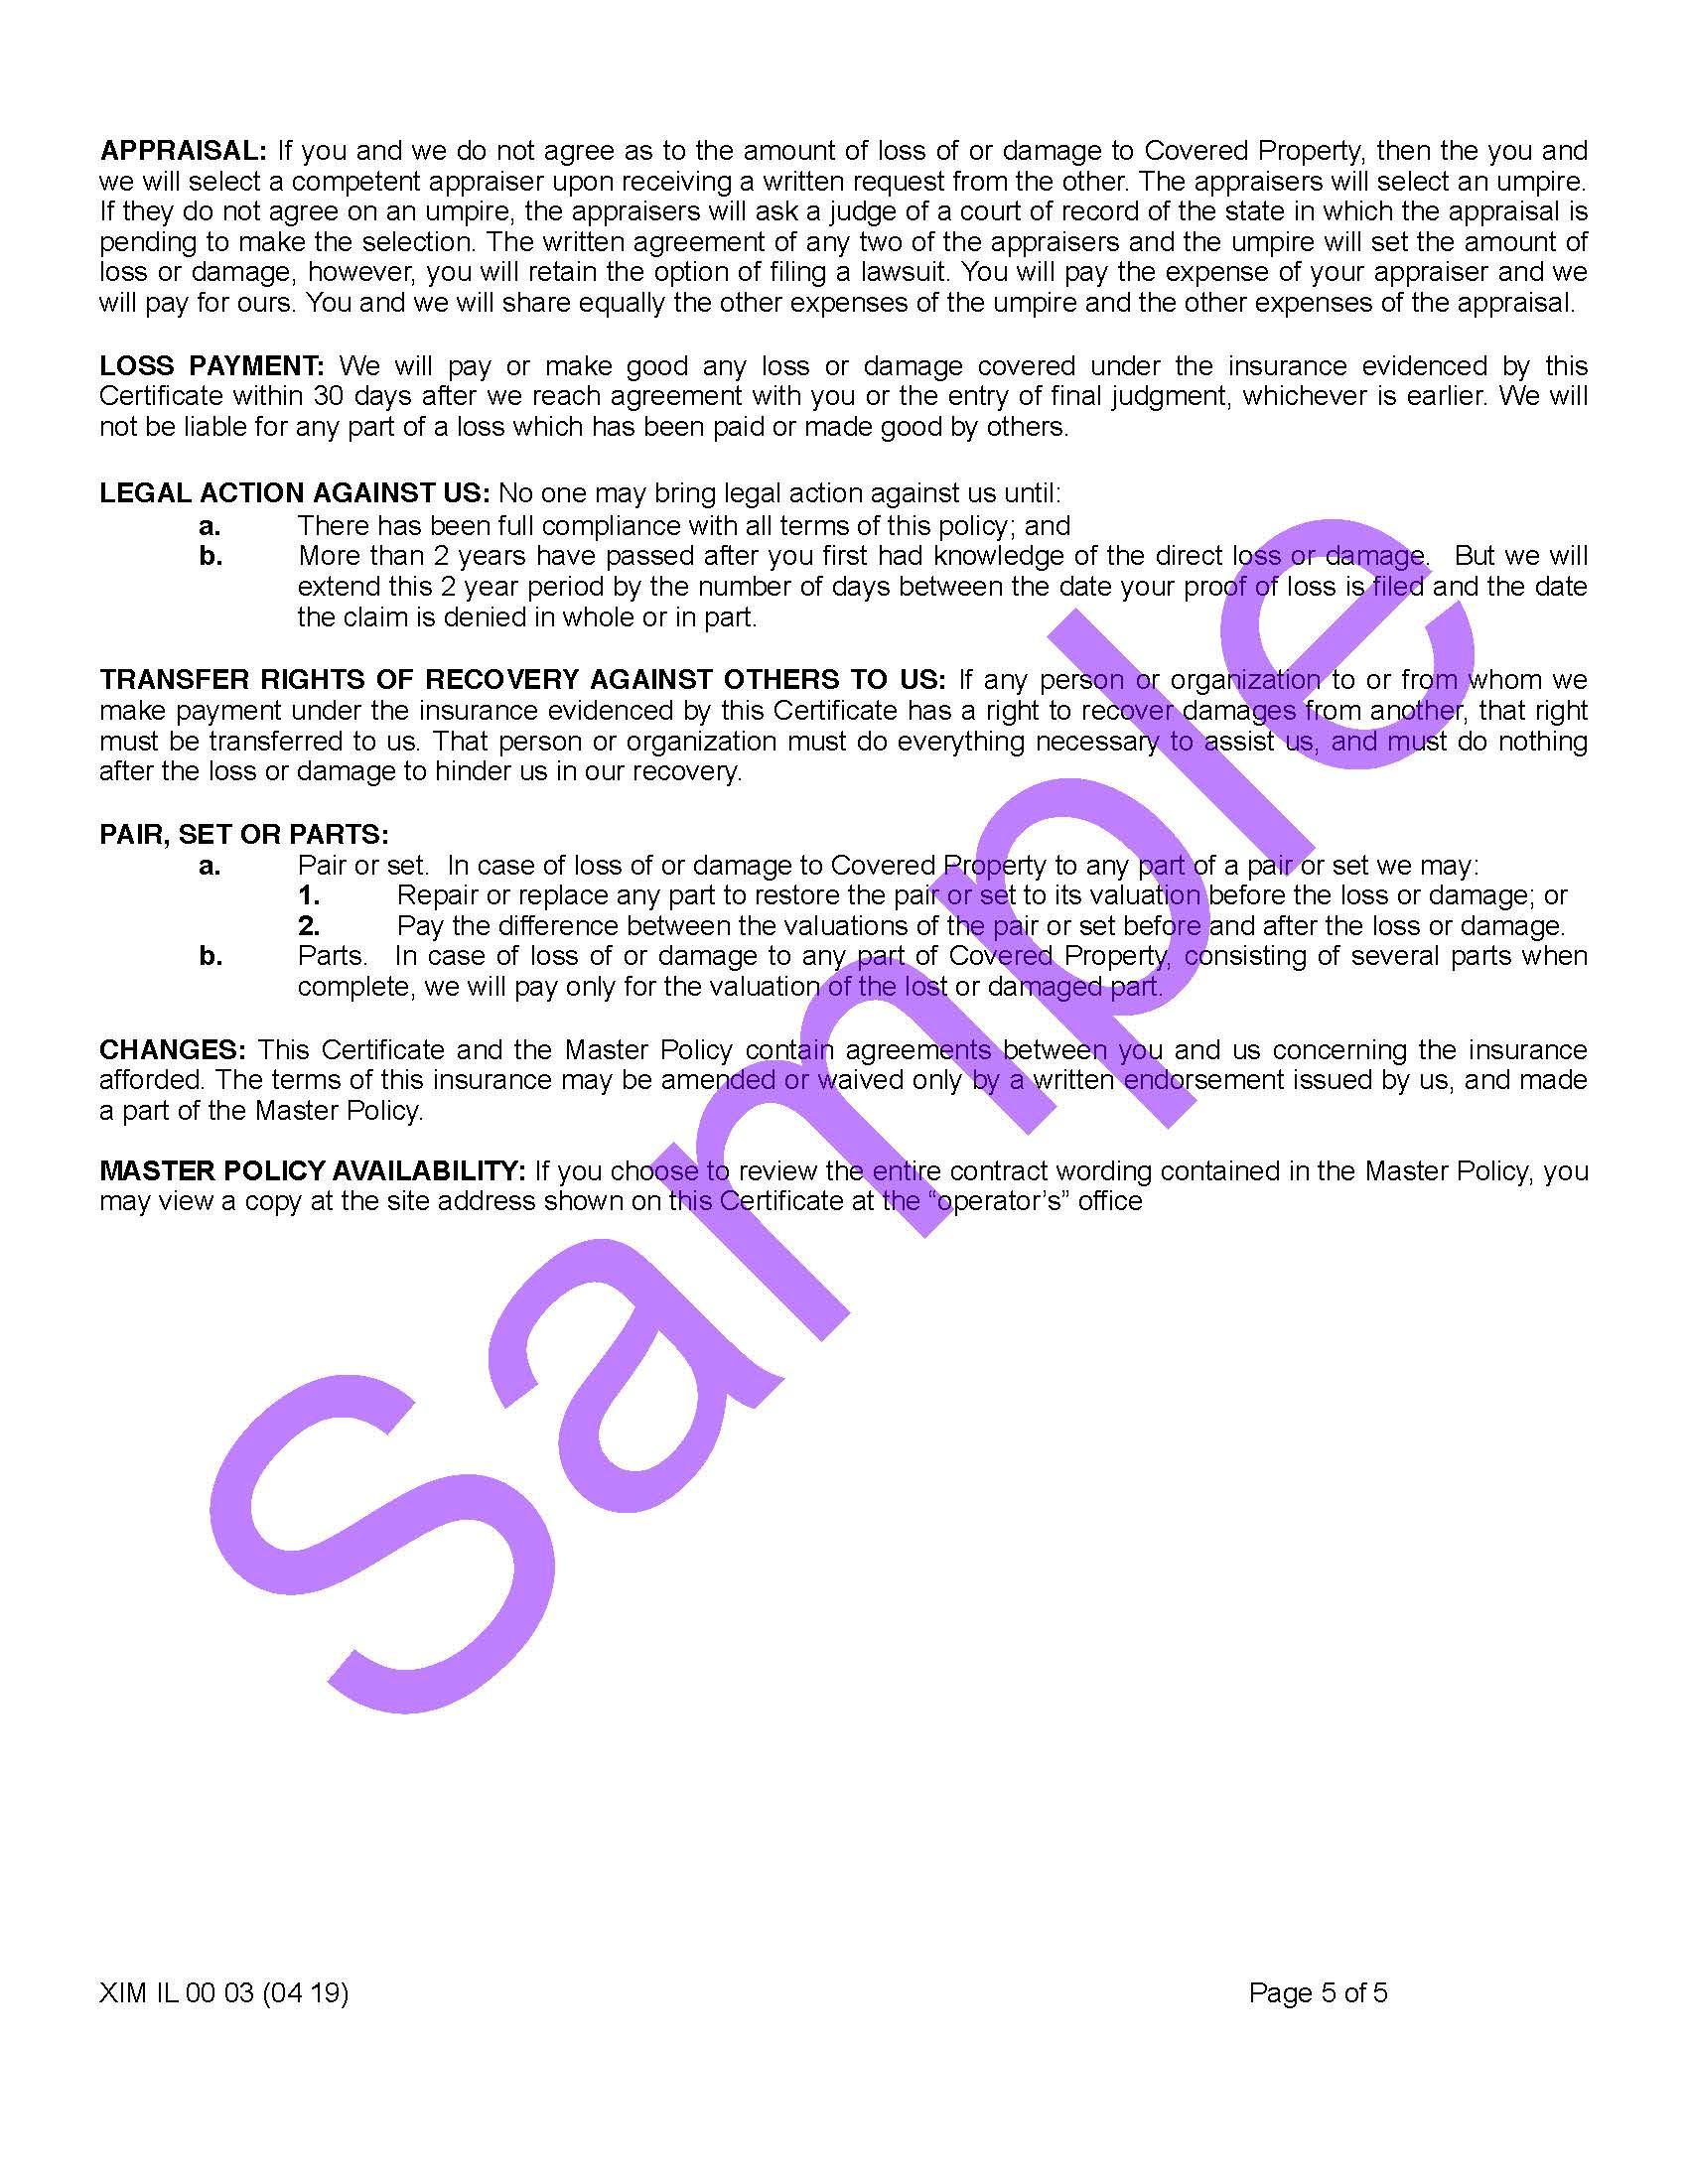 XIM IL 00 03 04 19 Illinois Certificate of InsuranceSample_Page_5.jpg